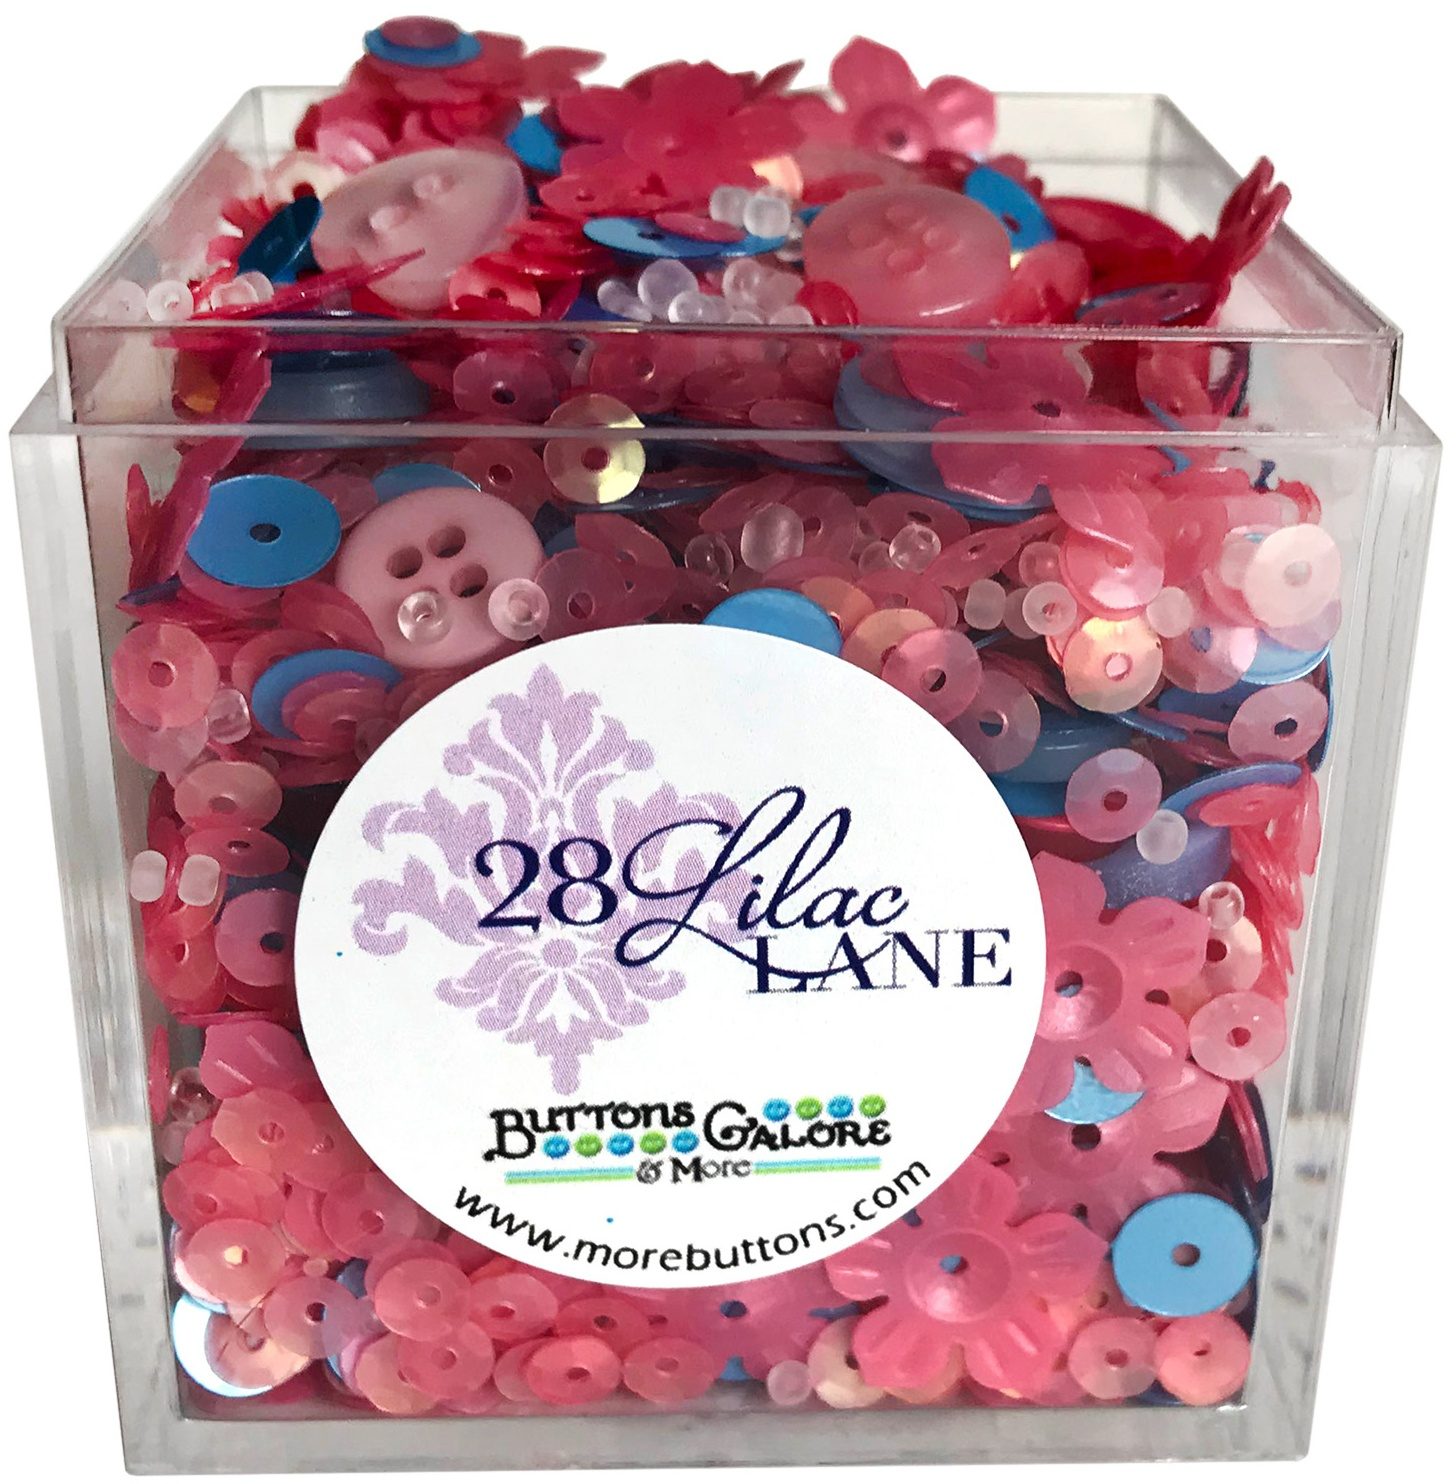 28 Lilac Lane Shaker Mix 65g-Cherries In Bloom